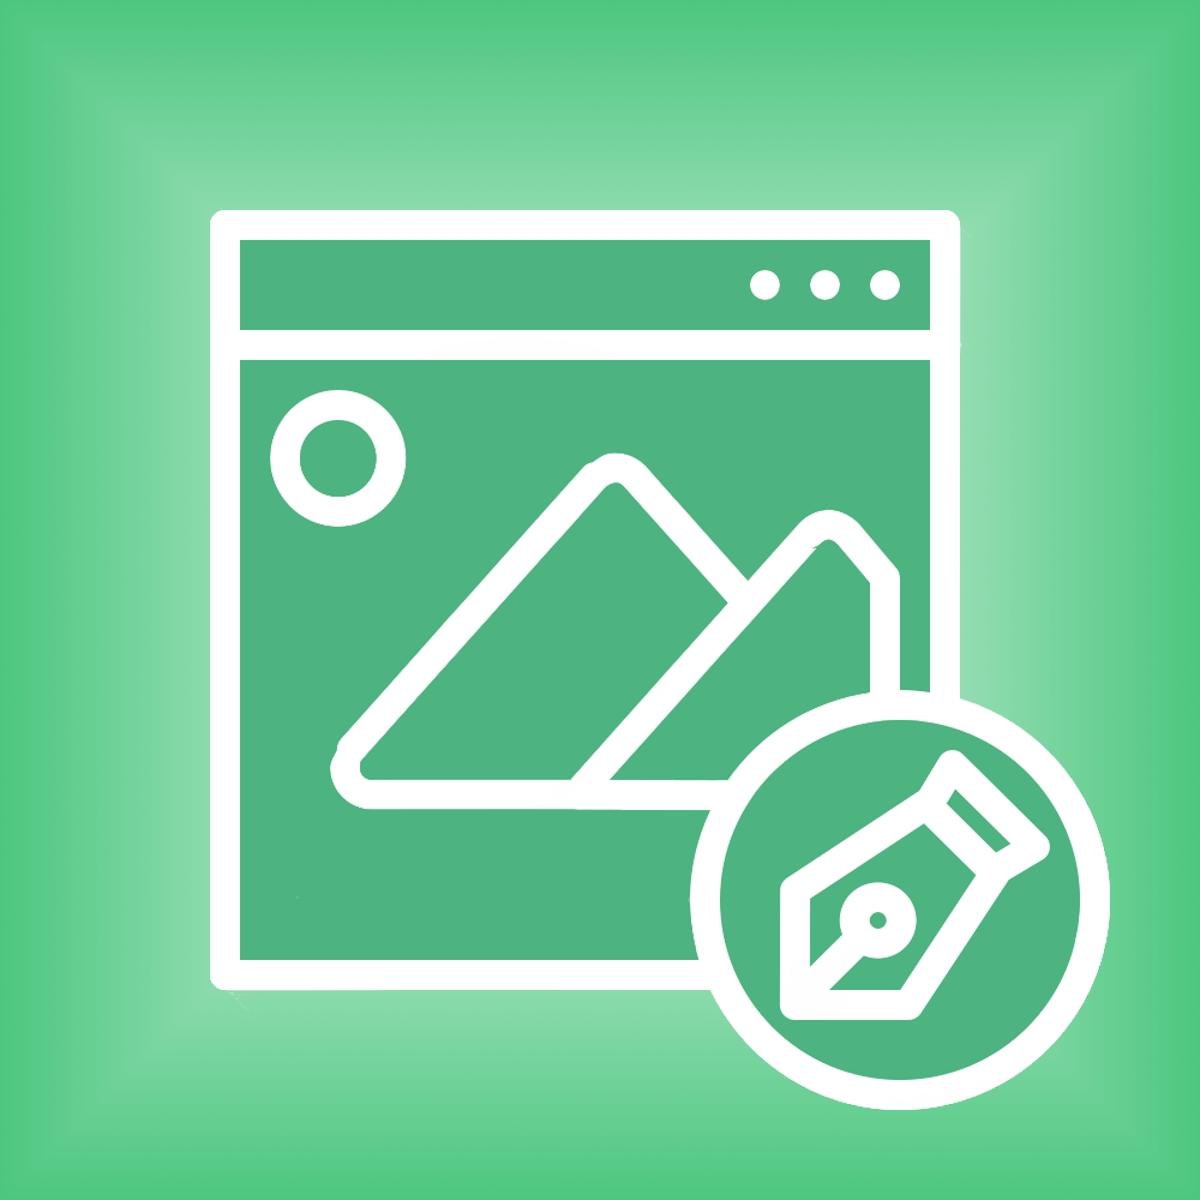 Shopify Product Image Resize app by Pixpix